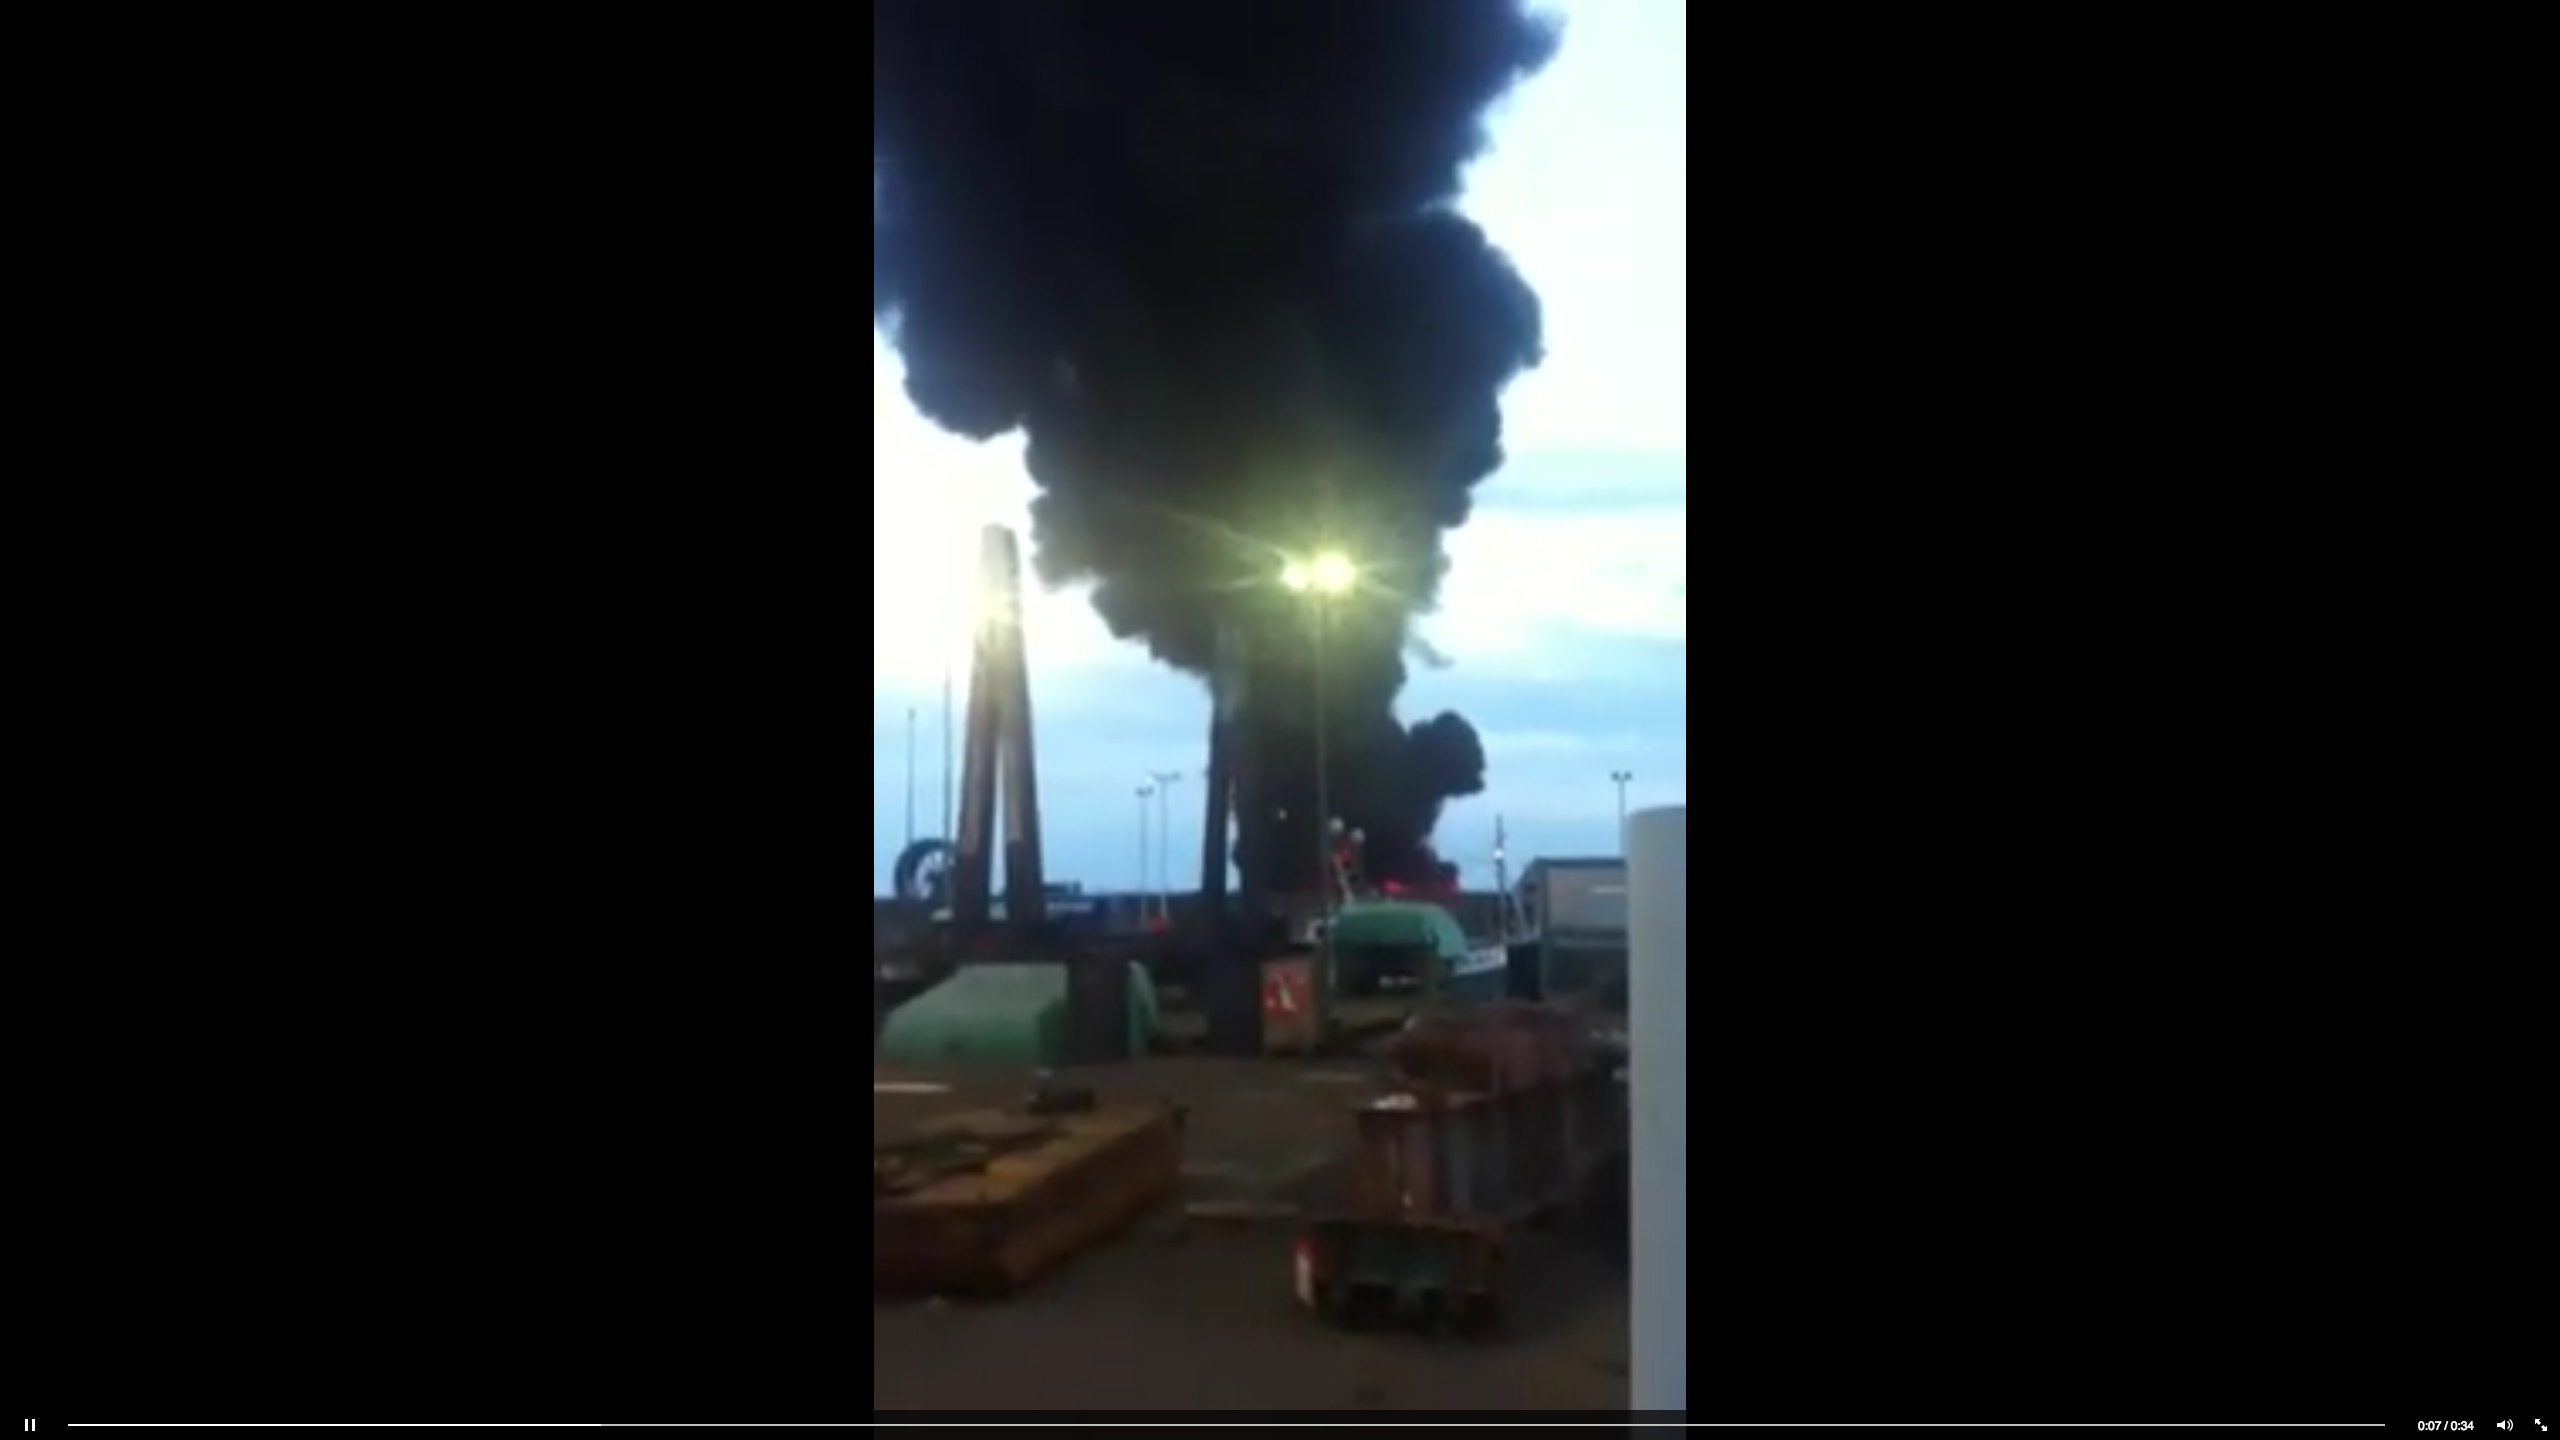 The blaze at Peterhead Harbour